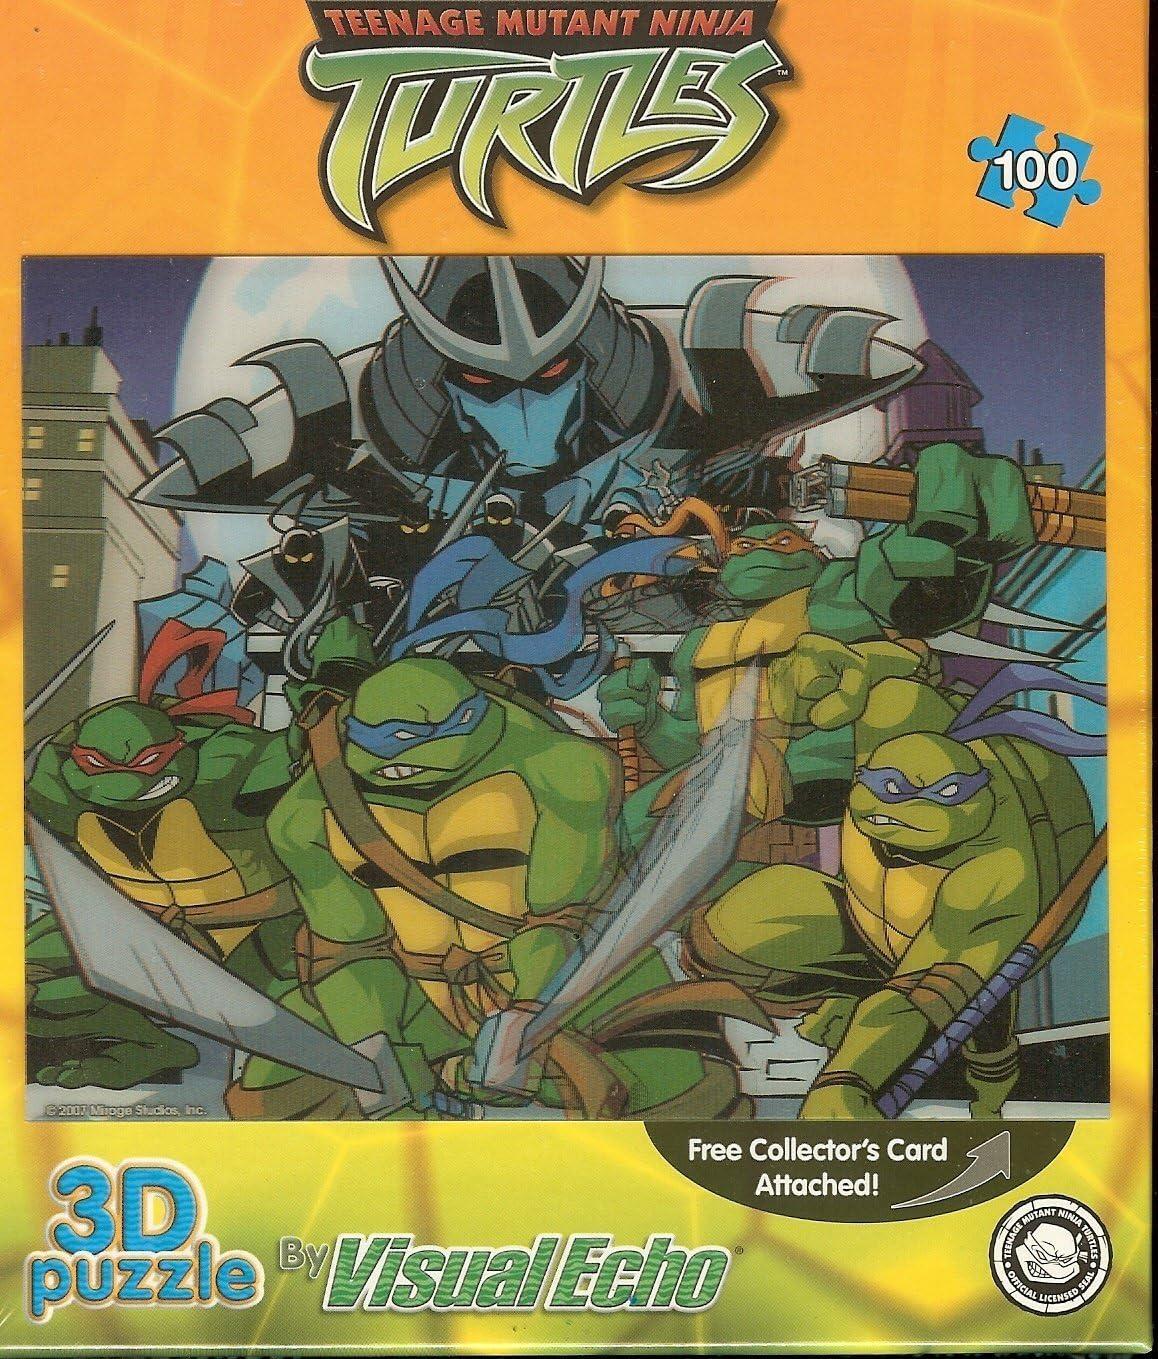 Visual Echo 3D Puzzle Teenage Mutant Ninja Turtles TMNT Lenticular Puzzle 100 piece